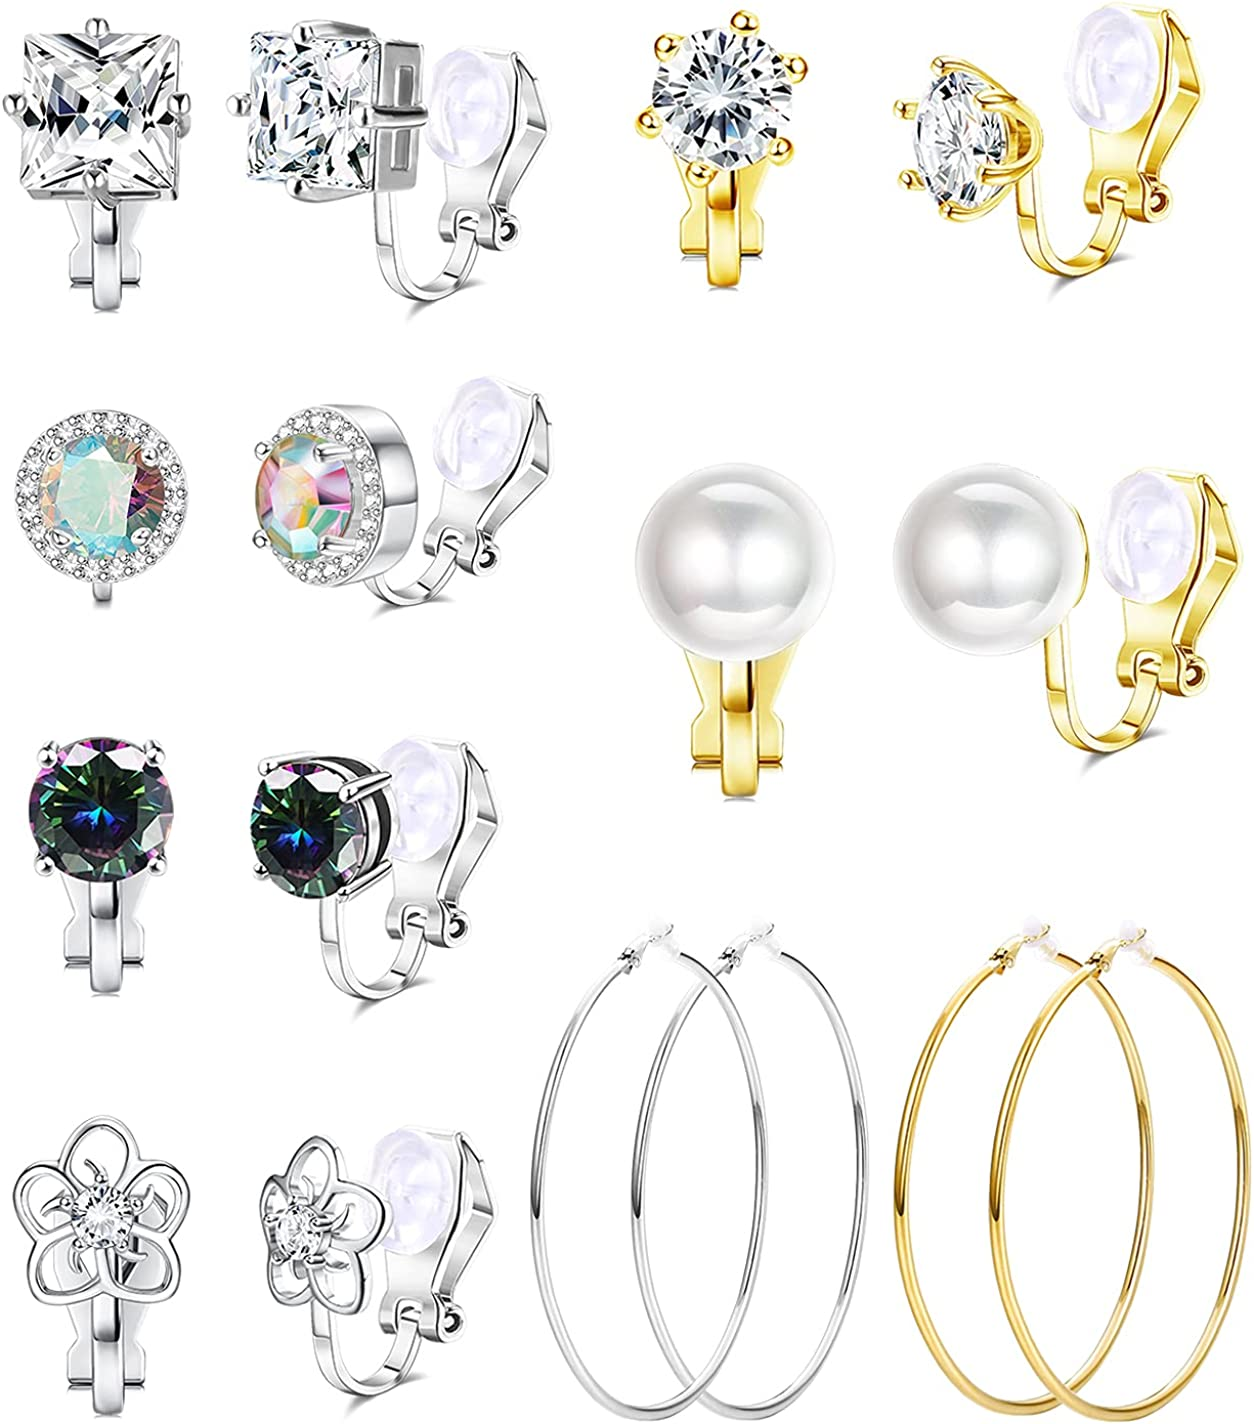 JOERICA 8 Pairs Clip On Earrings for Women Big Hoop Clip-on Earrings Simulated Pearl CZ Cubic Zirconia Non Pierced Clip on Earrings Set